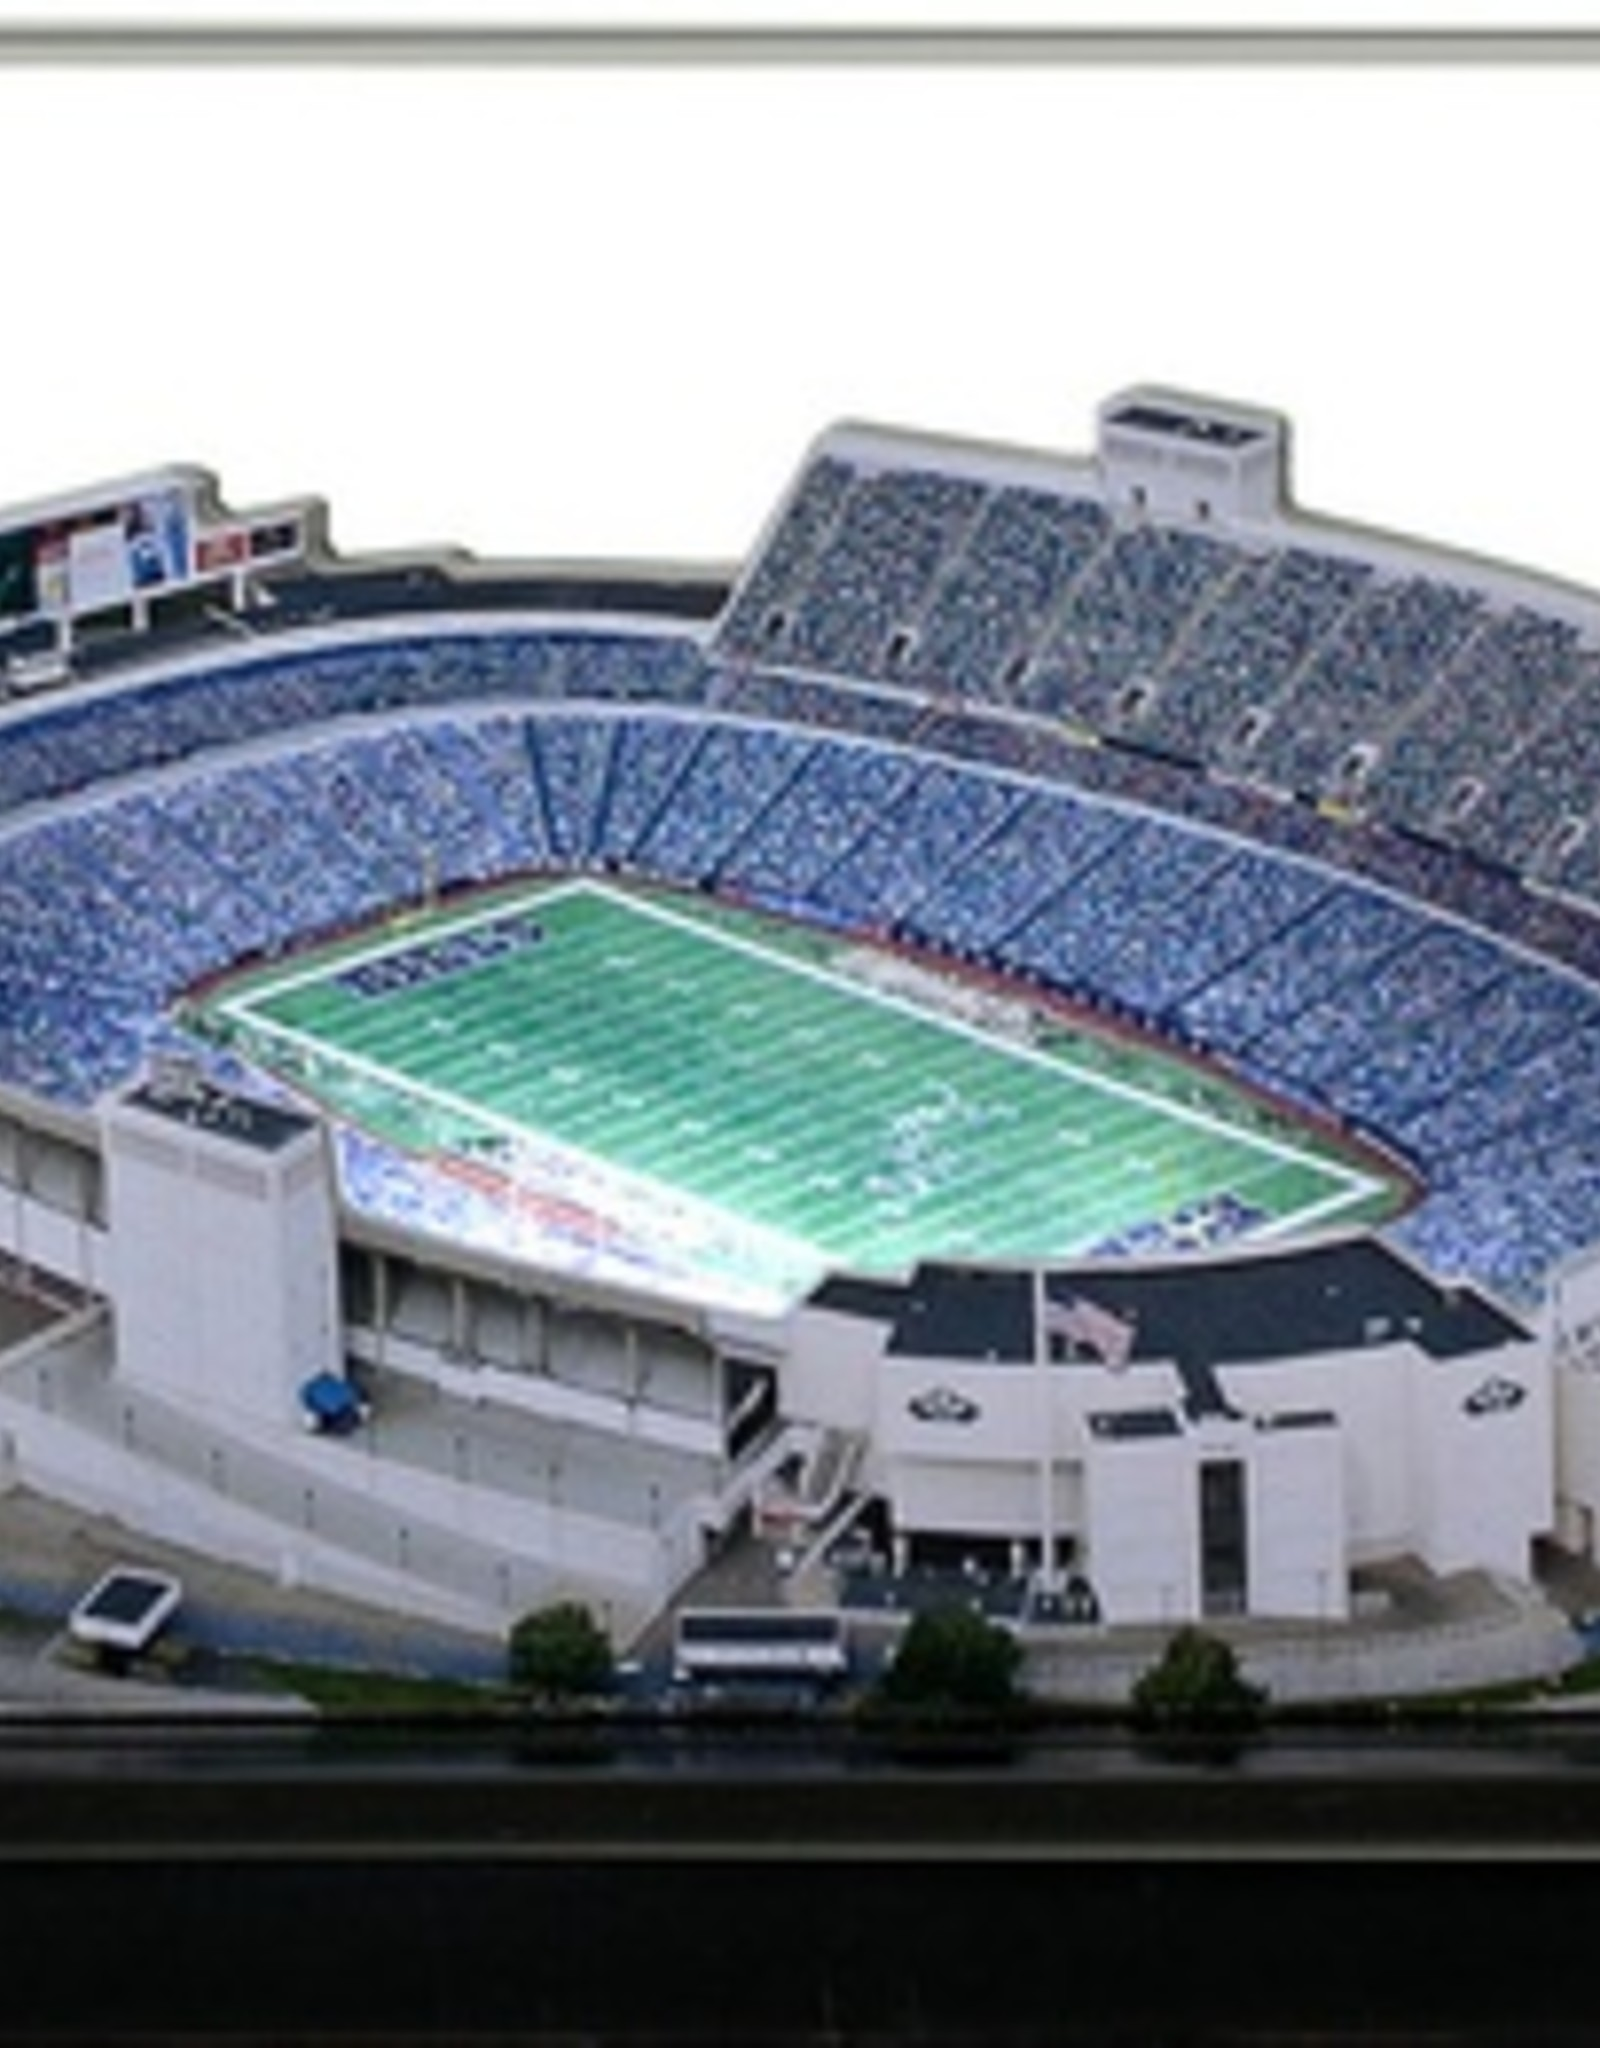 HOMEFIELDS Buffalo Bills 19IN Lighted Replica Ralph Wilson Stadium